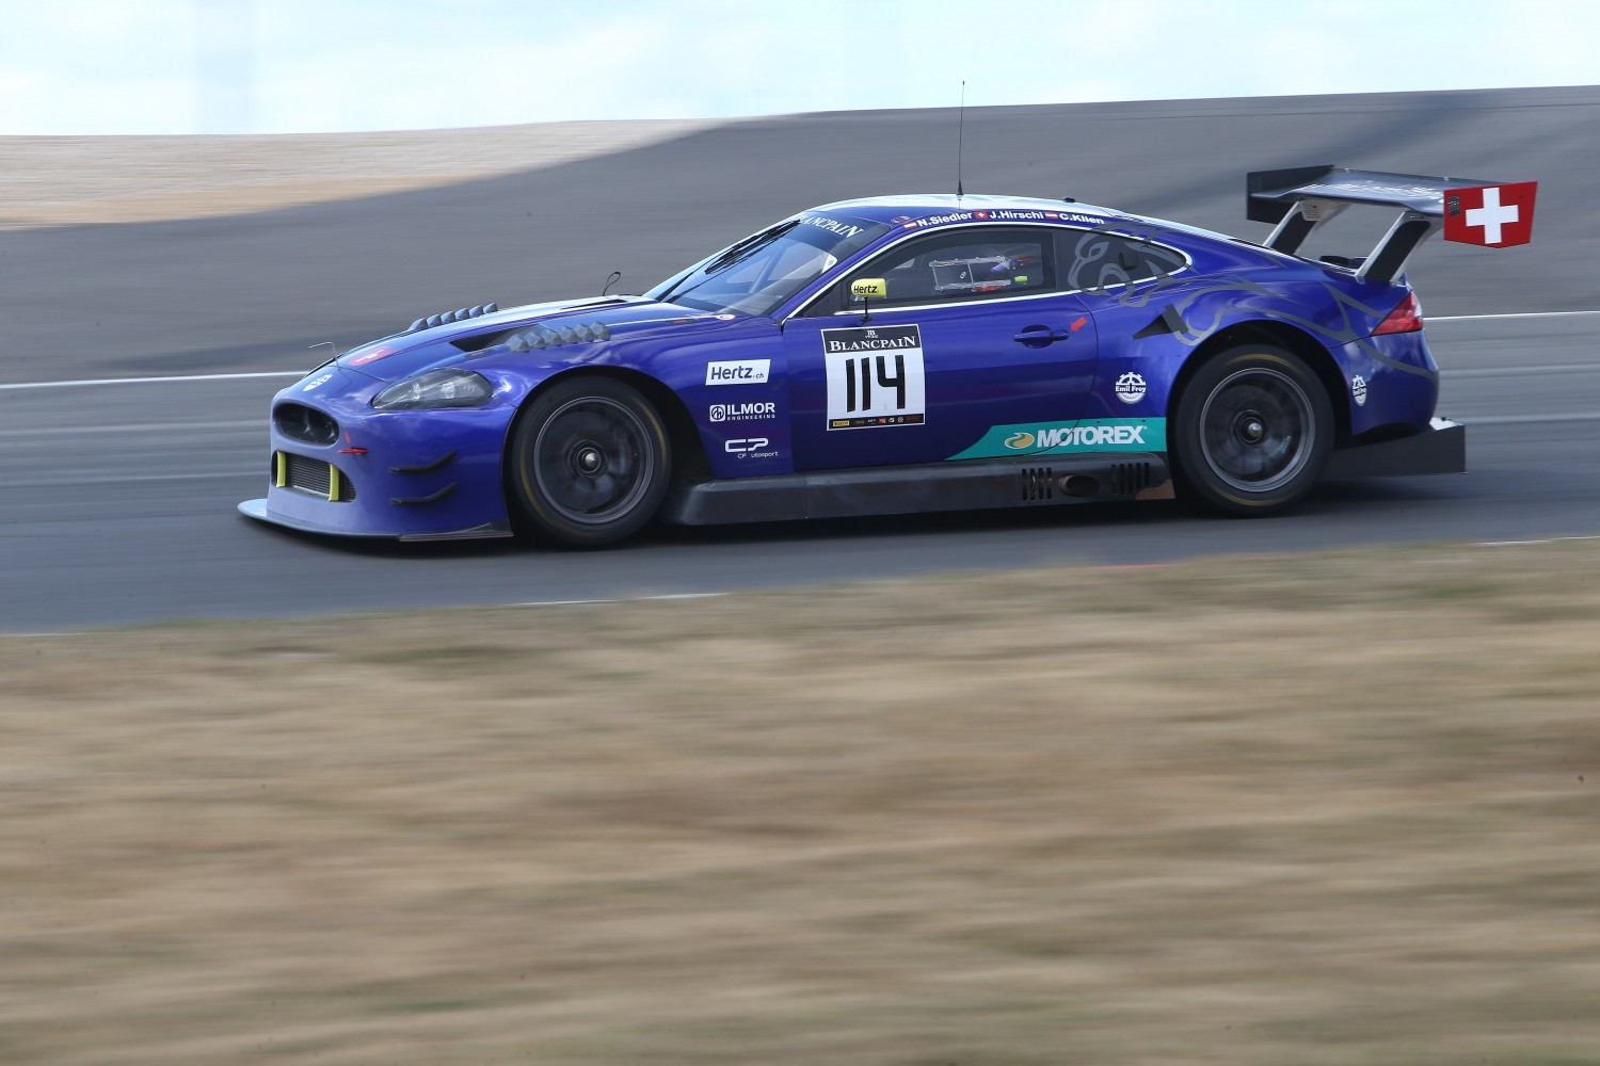 Two Emil Frey Jaguar in 2017 Endurance Cup